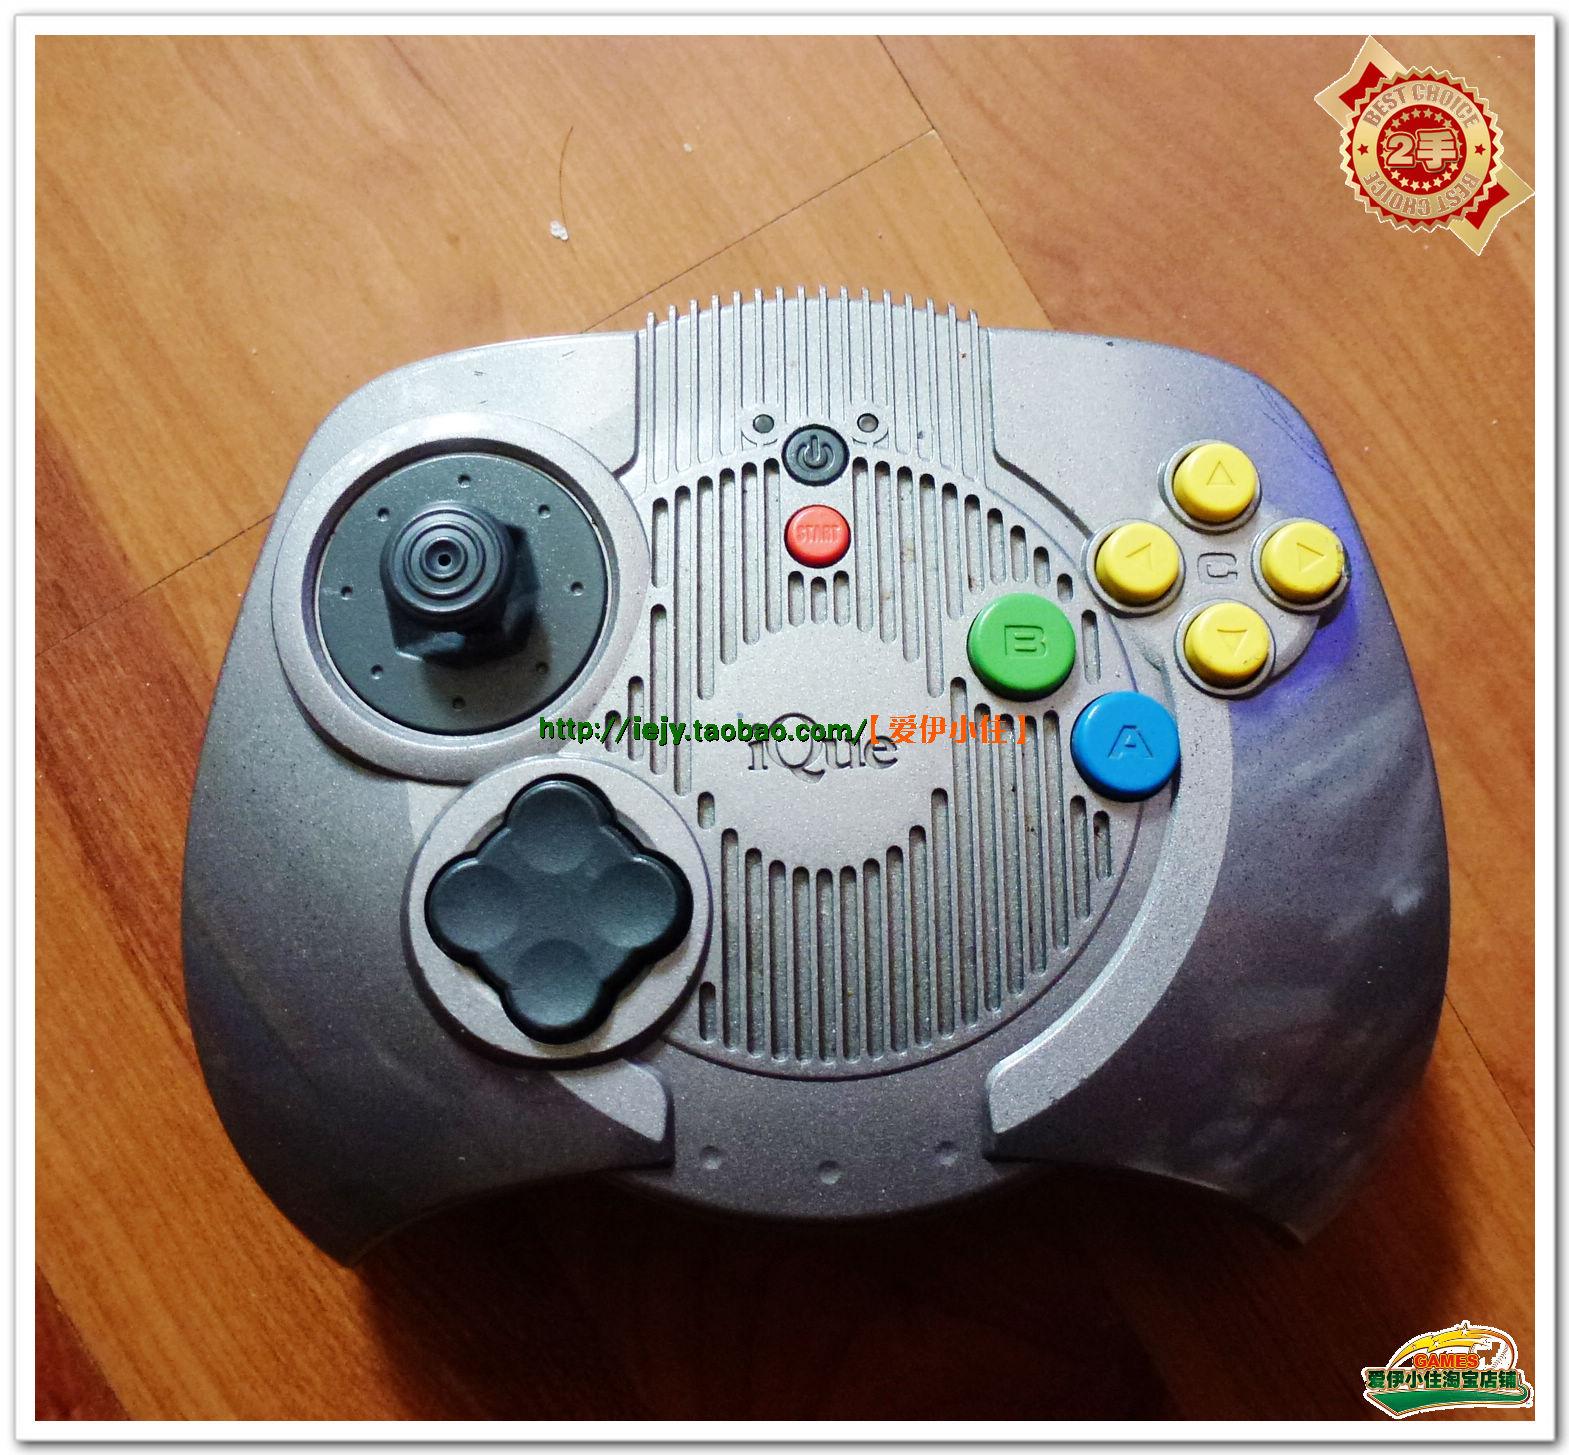 Запчасти для Nintendo NGC FC N64 SFC Артикул 593615450276